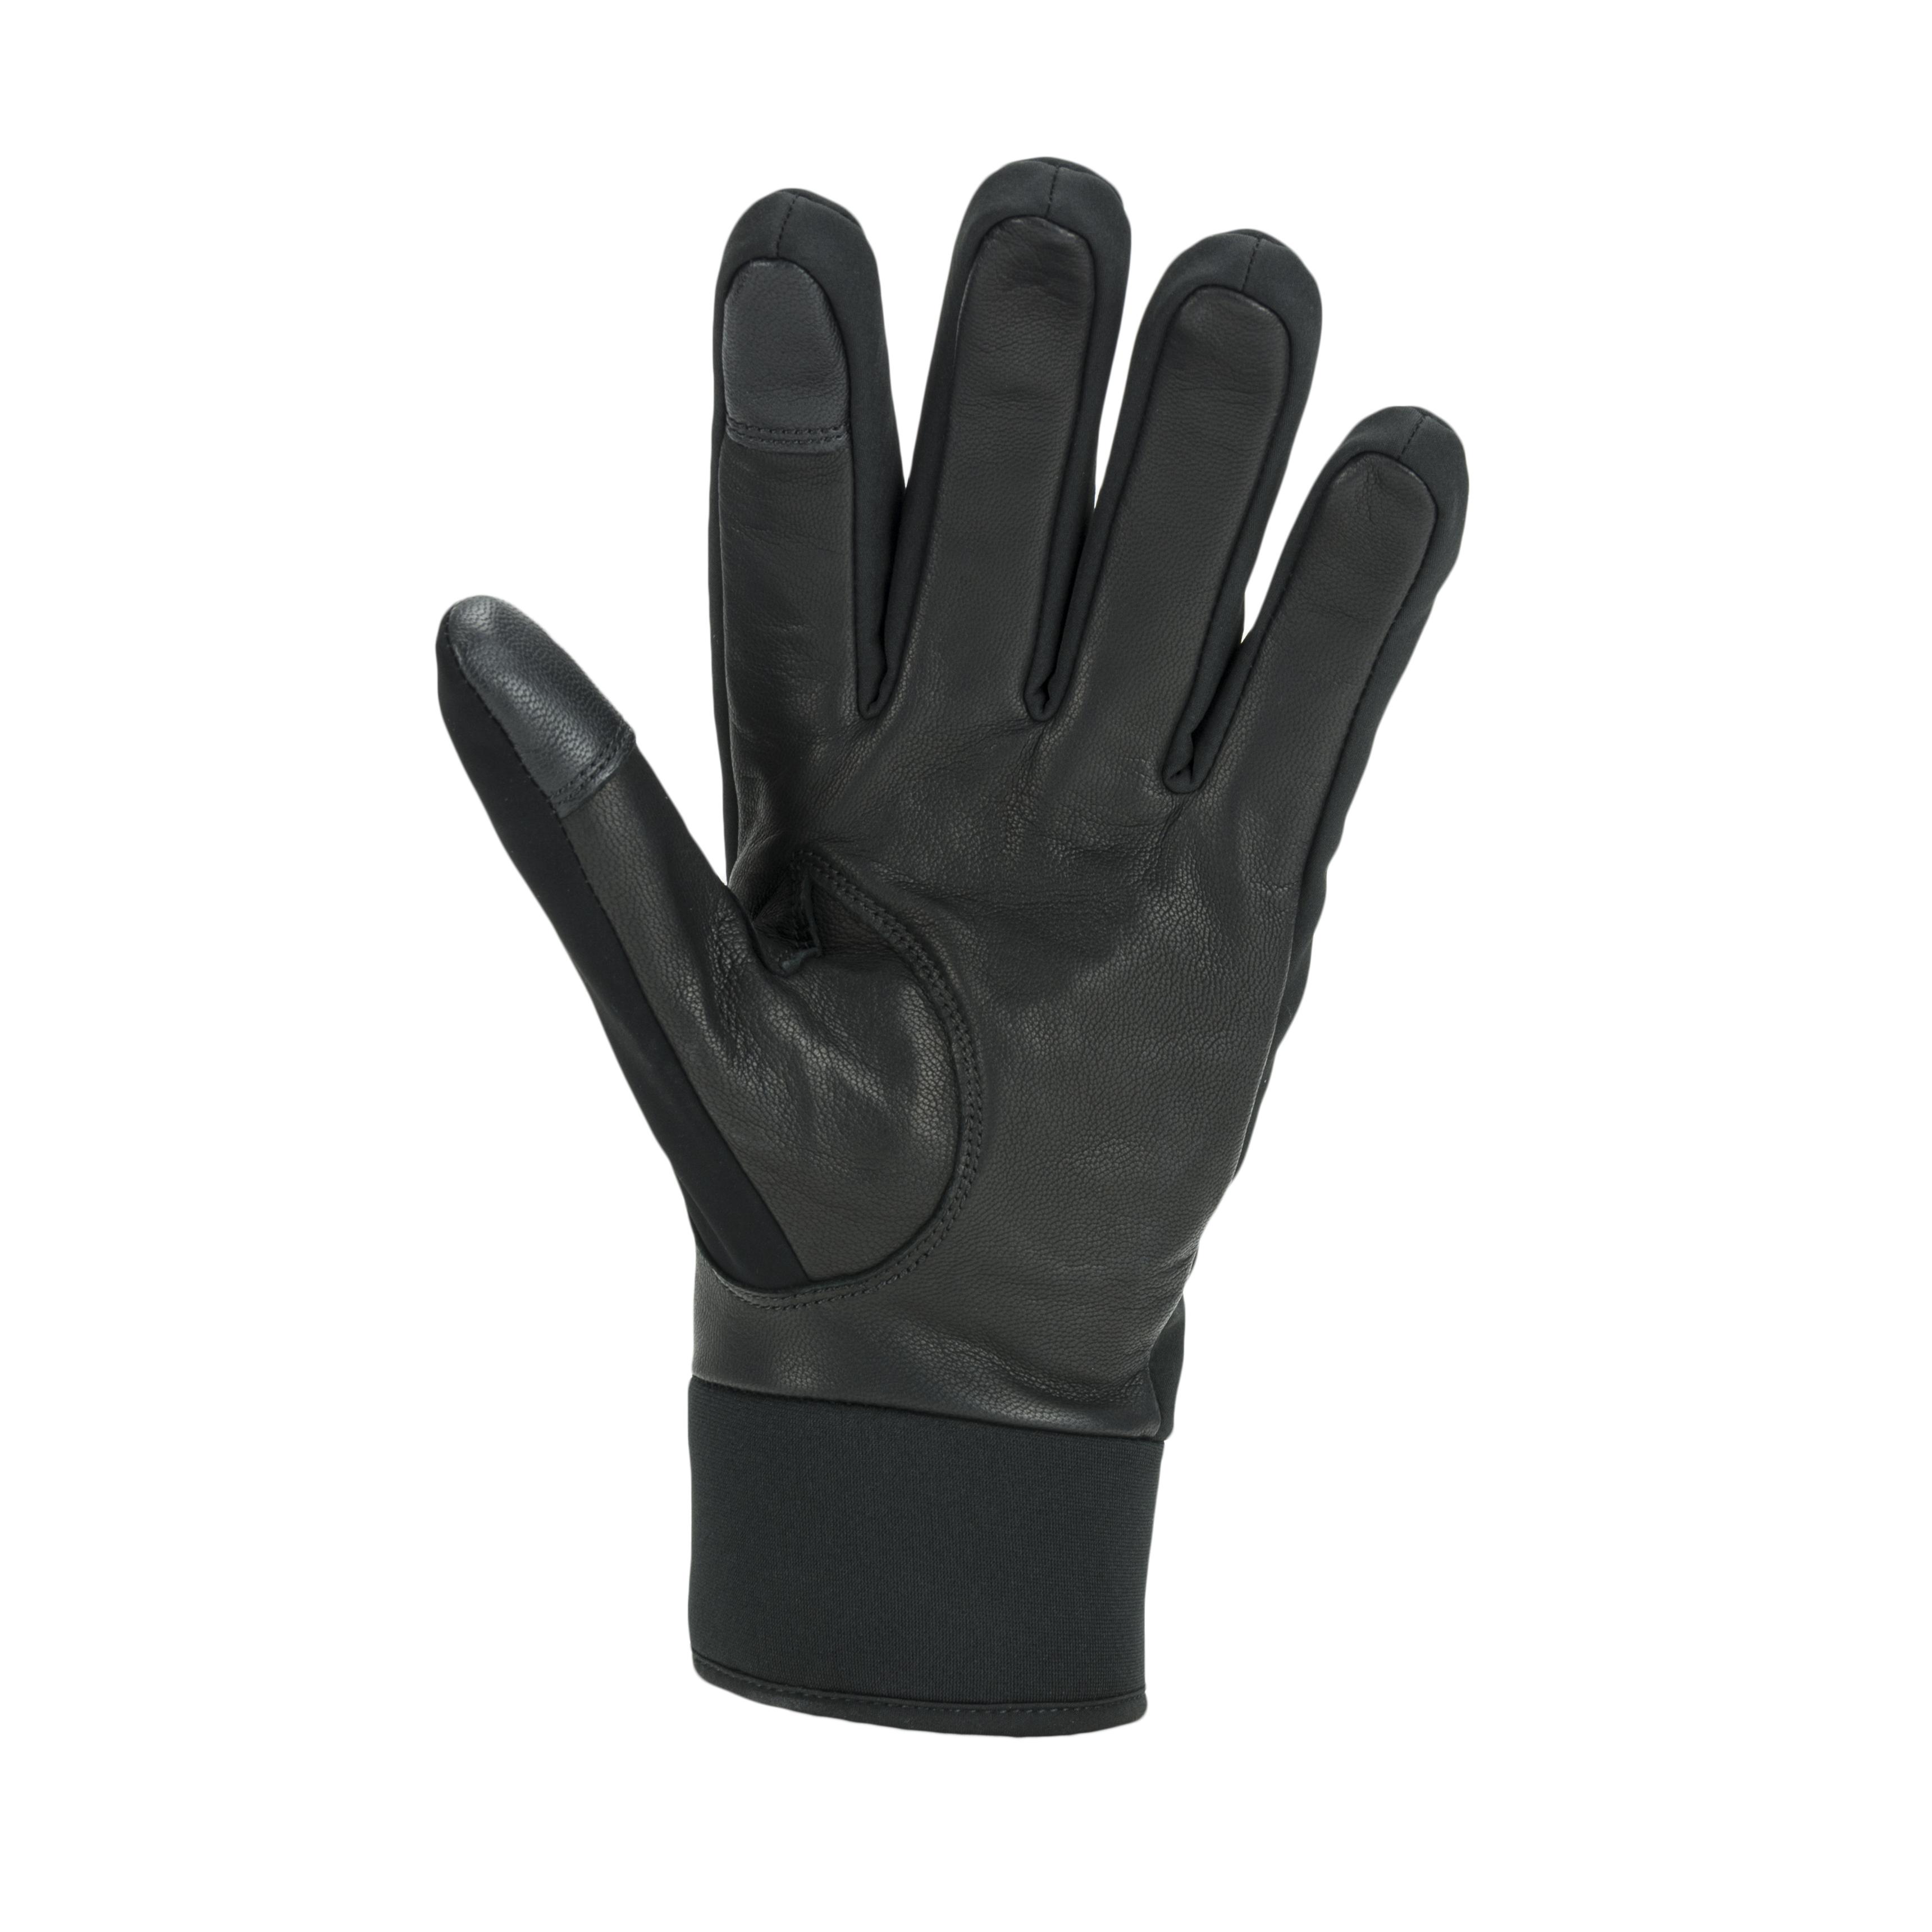 Sealskinz  All Weather Insulated Glove (unisex)